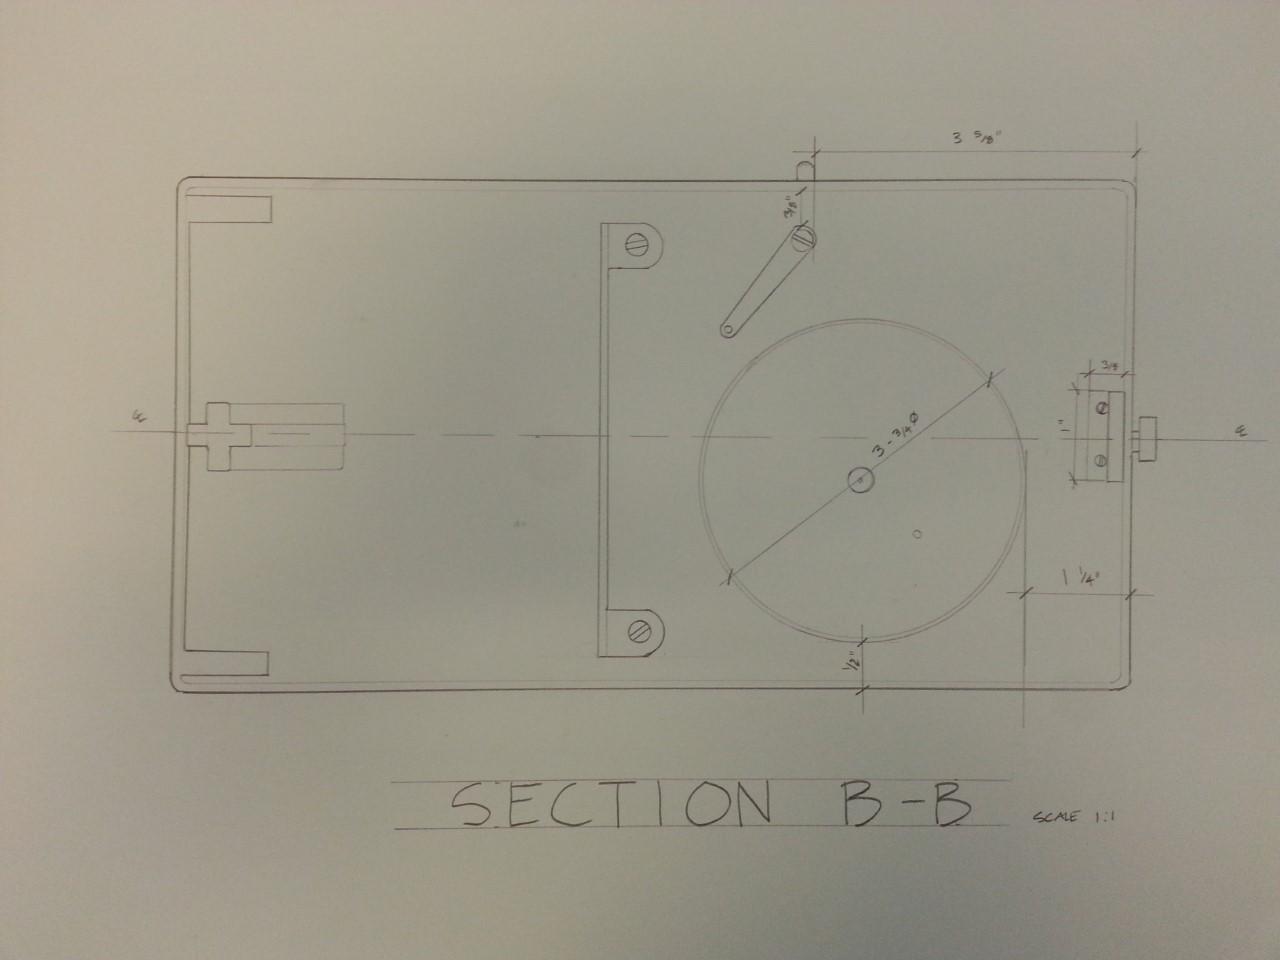 section-b-b